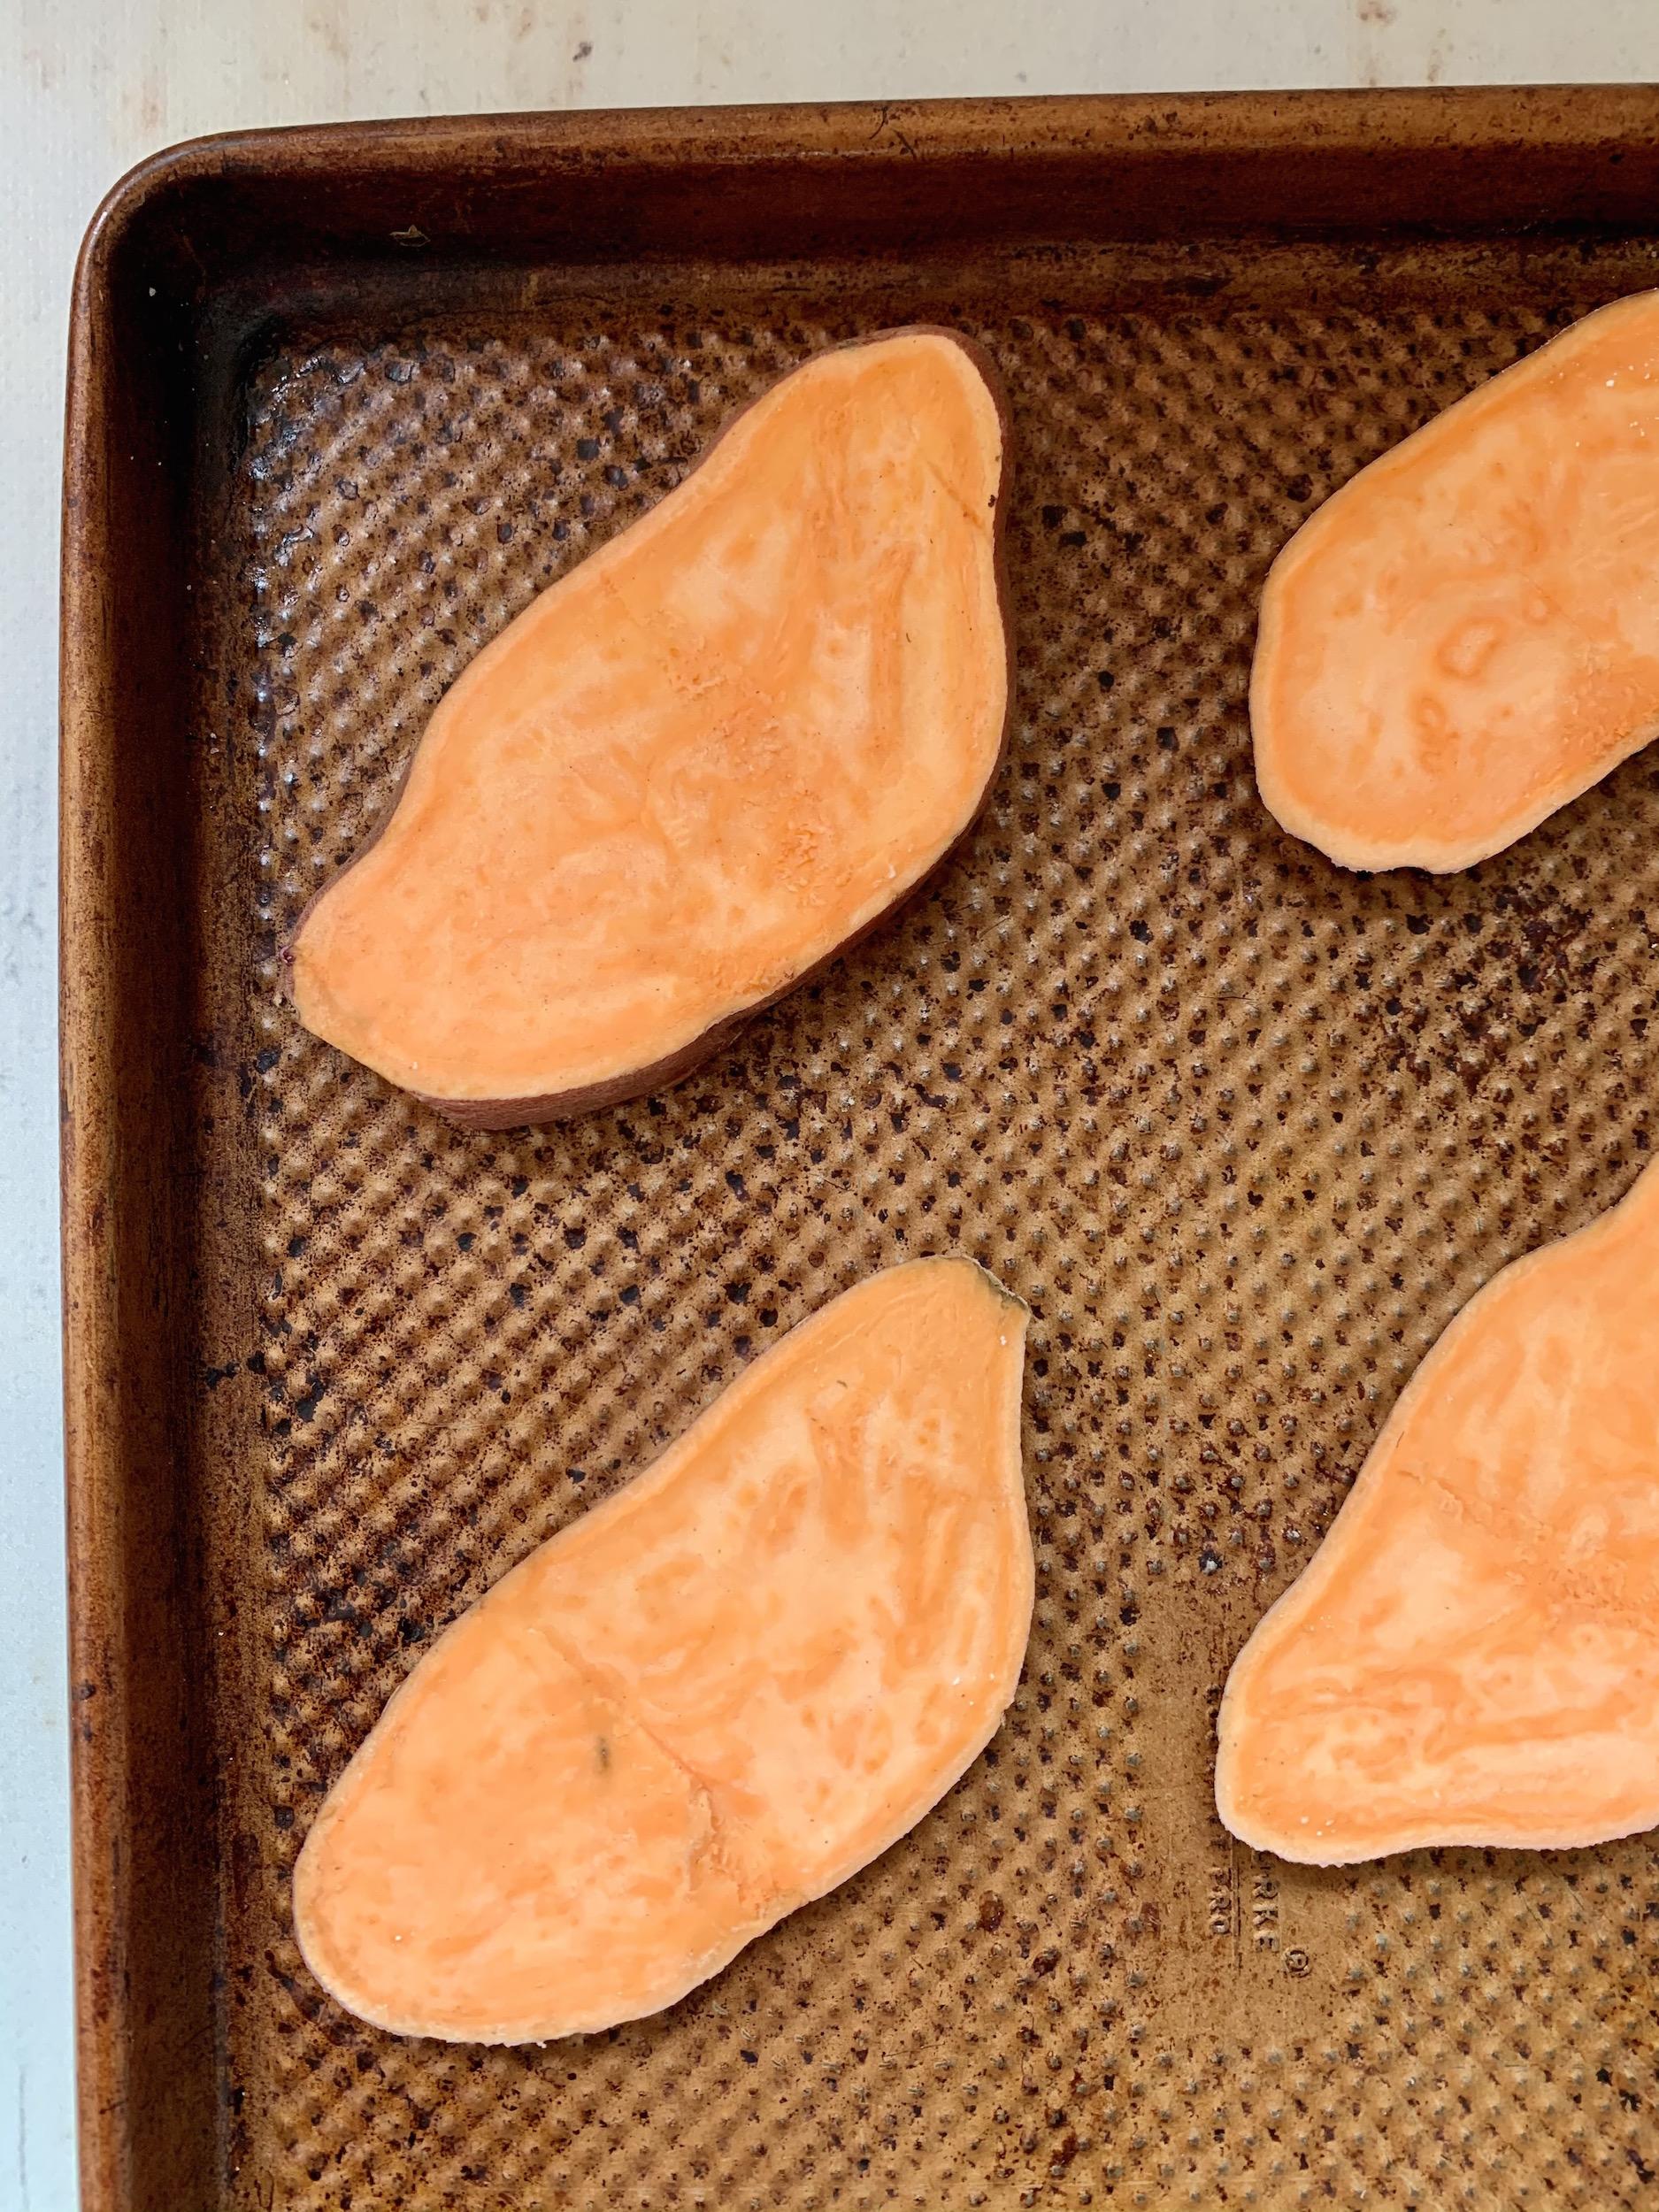 slices of raw sweet potato on a baking sheet